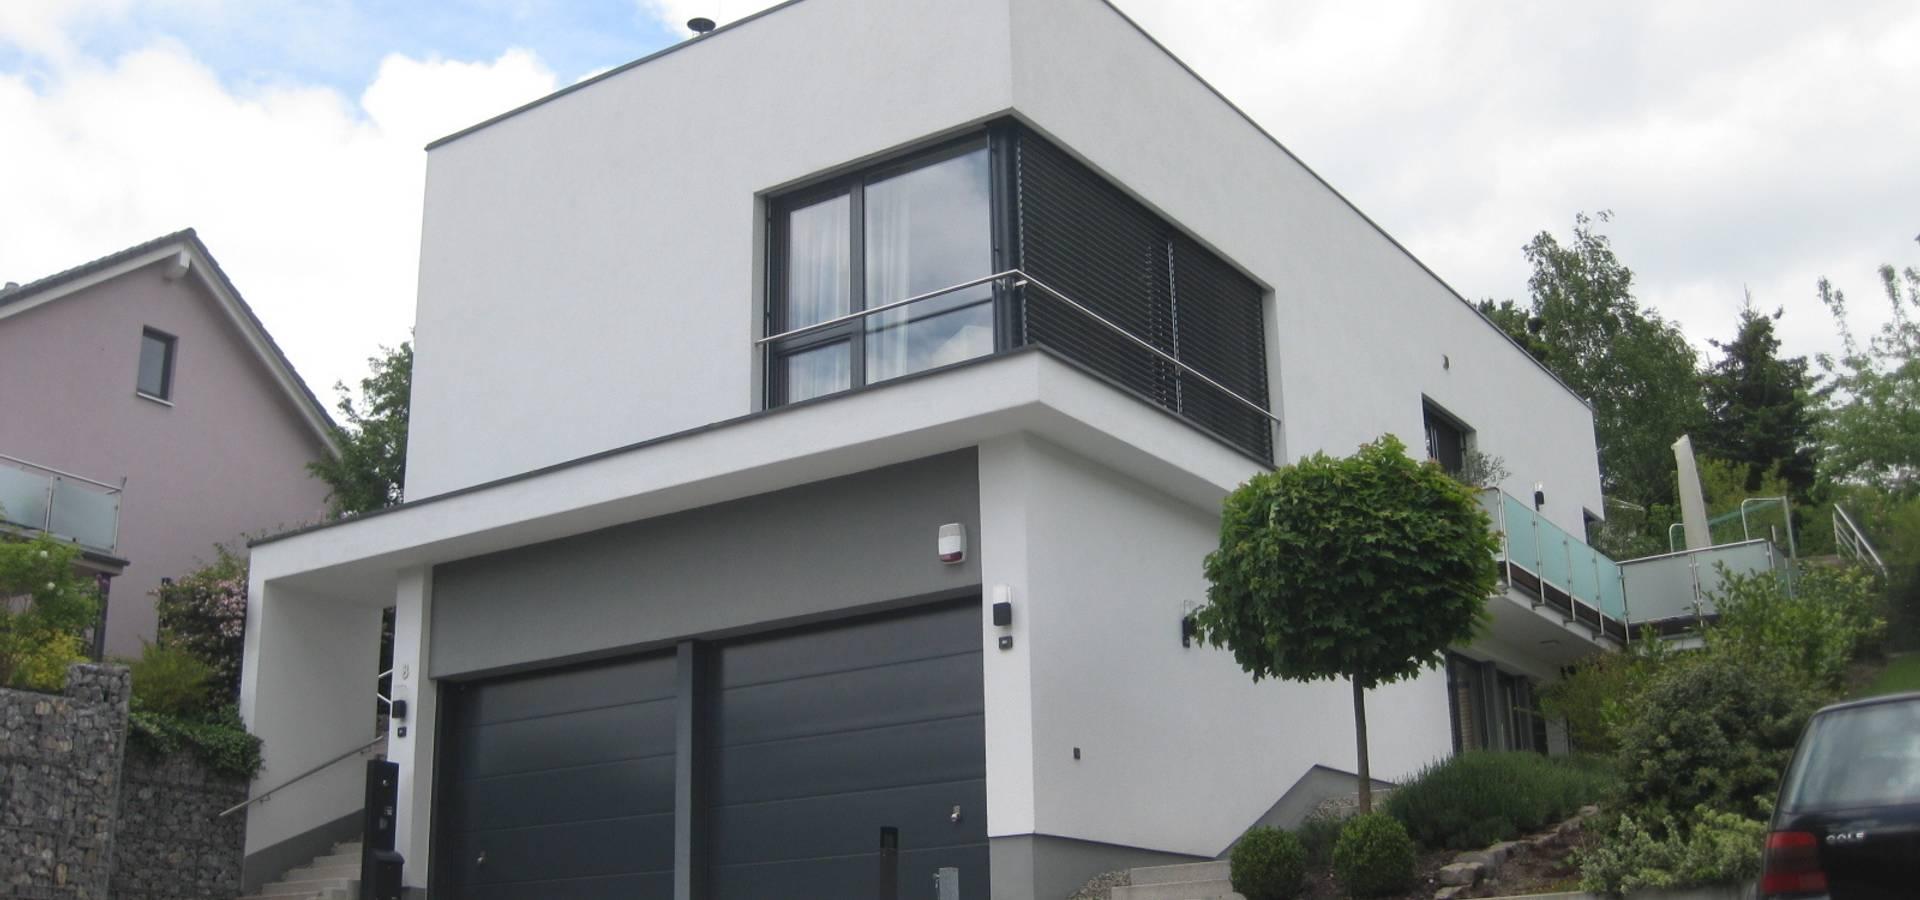 ETB BAUPROJEKT Jena GmbH